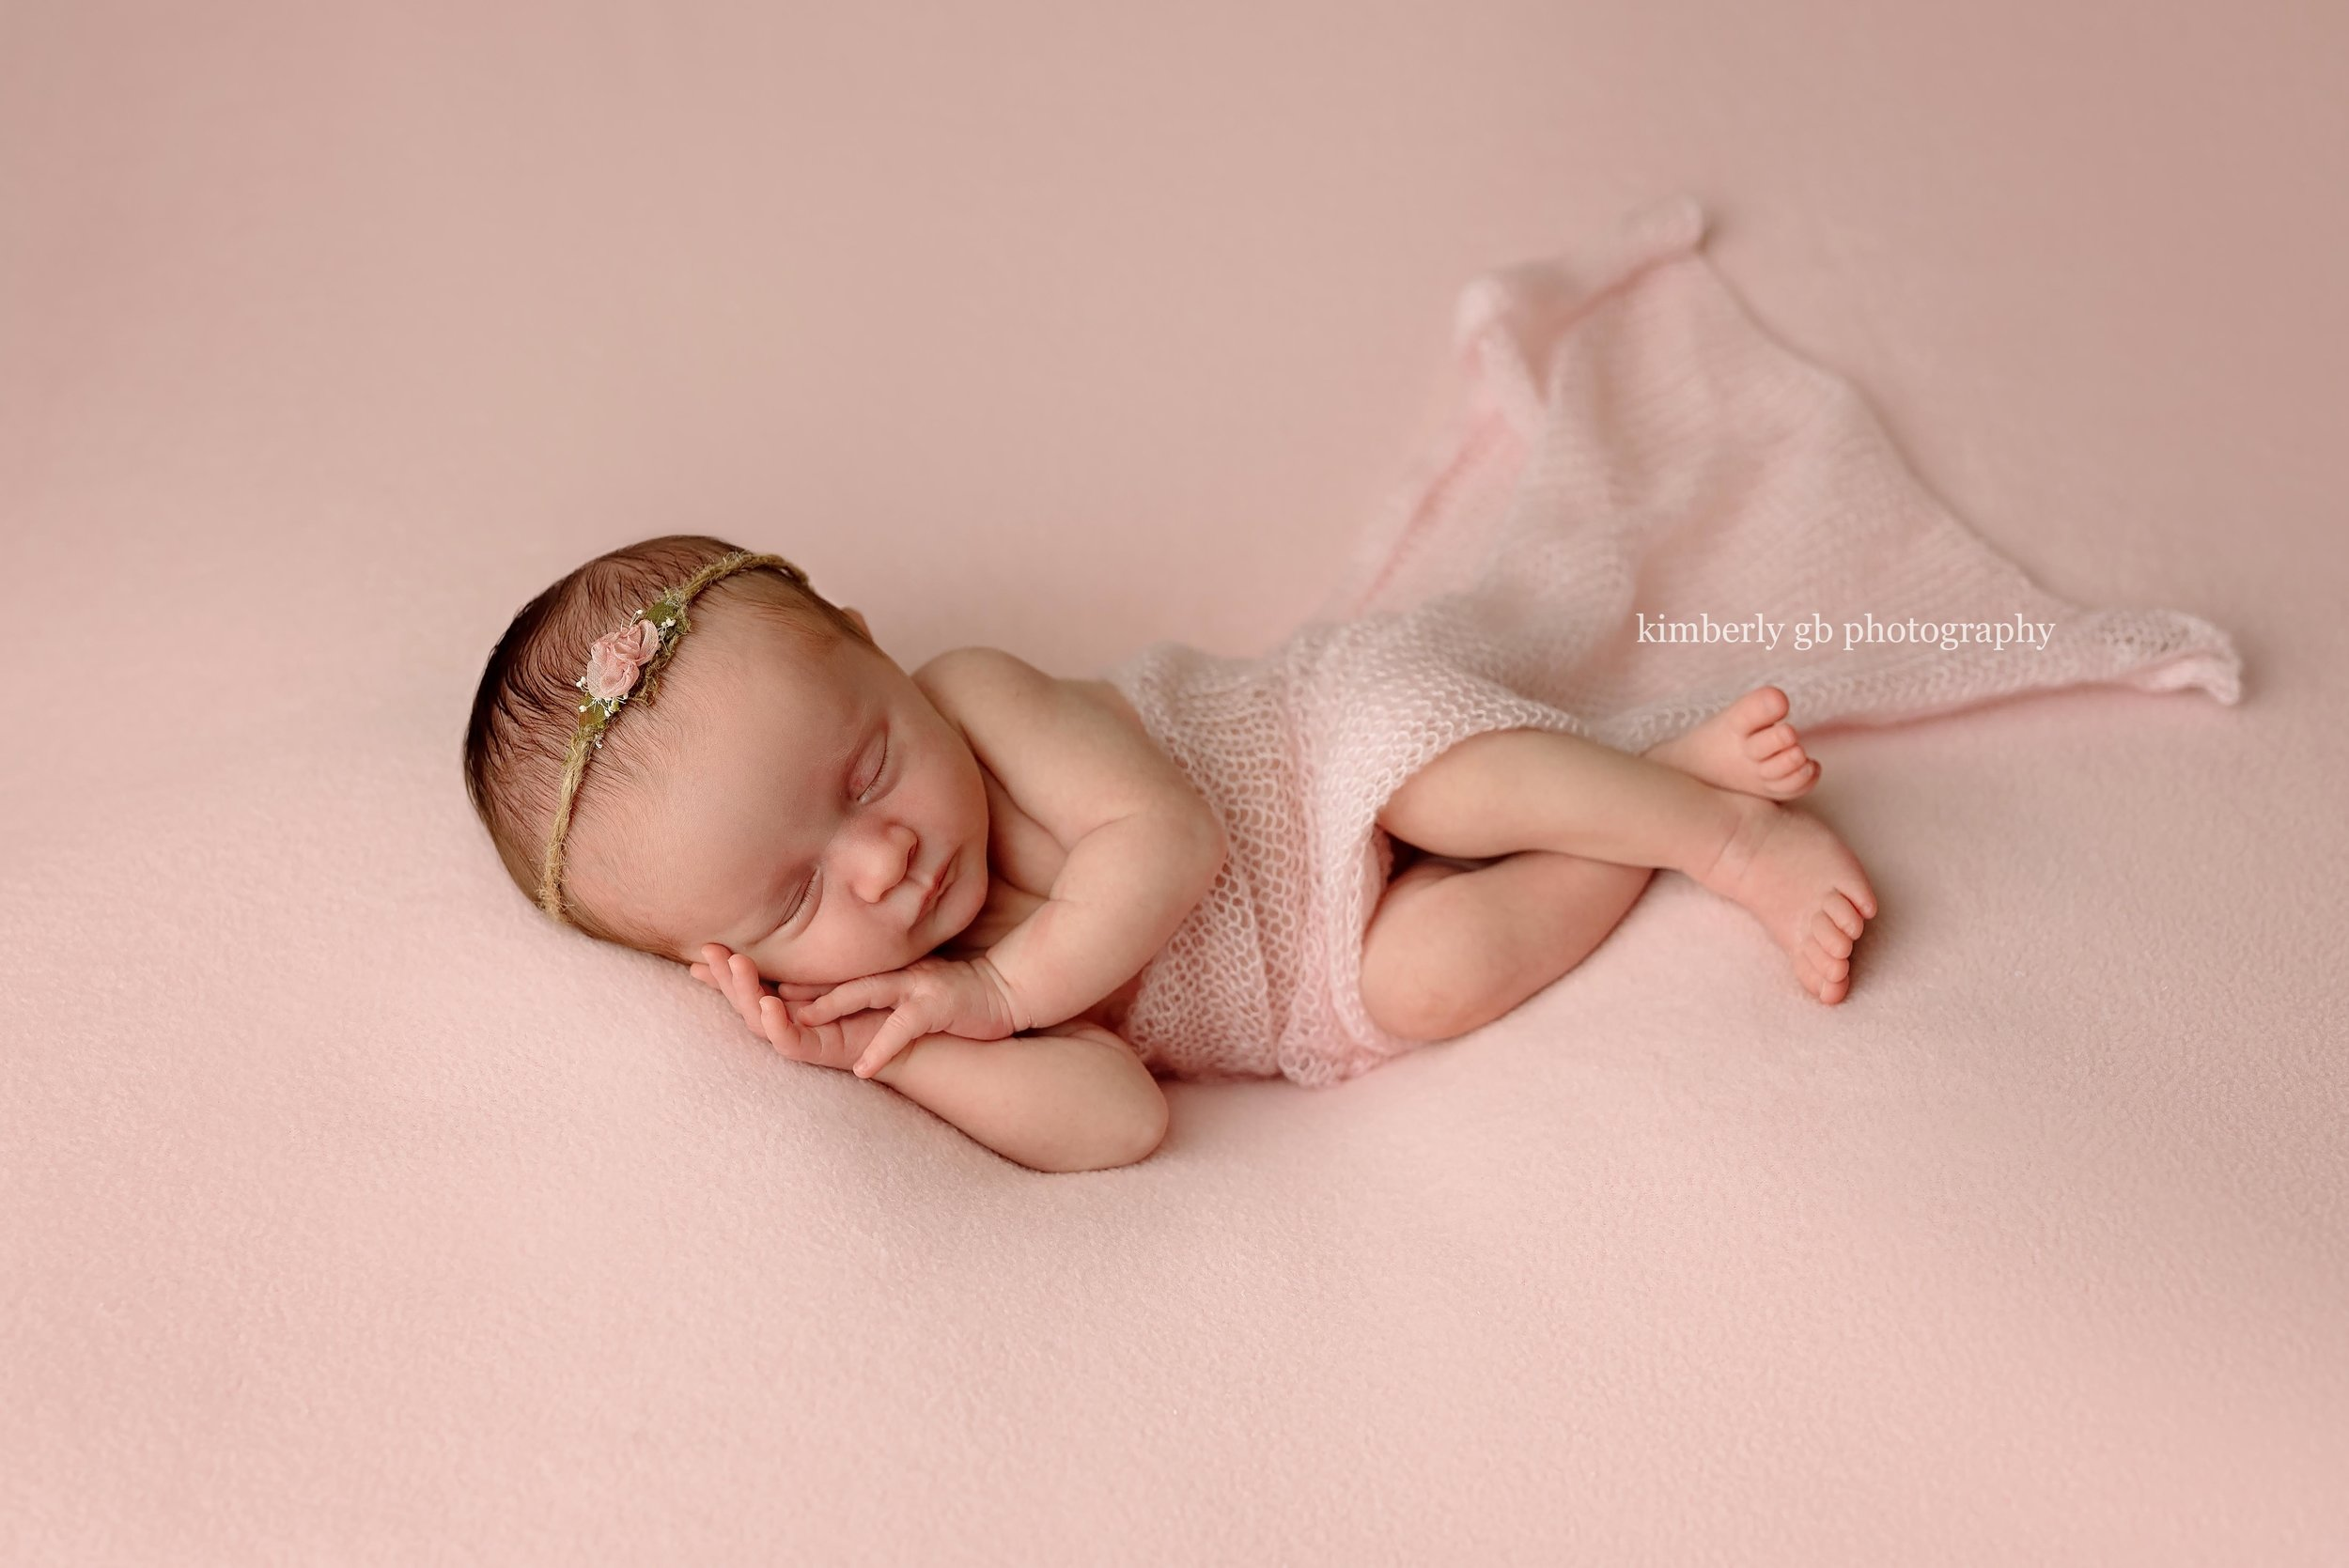 fotografia-de-recien-nacidos-bebes-newborn-en-puerto-rico-kimberly-gb-photography-fotografa-258.jpg